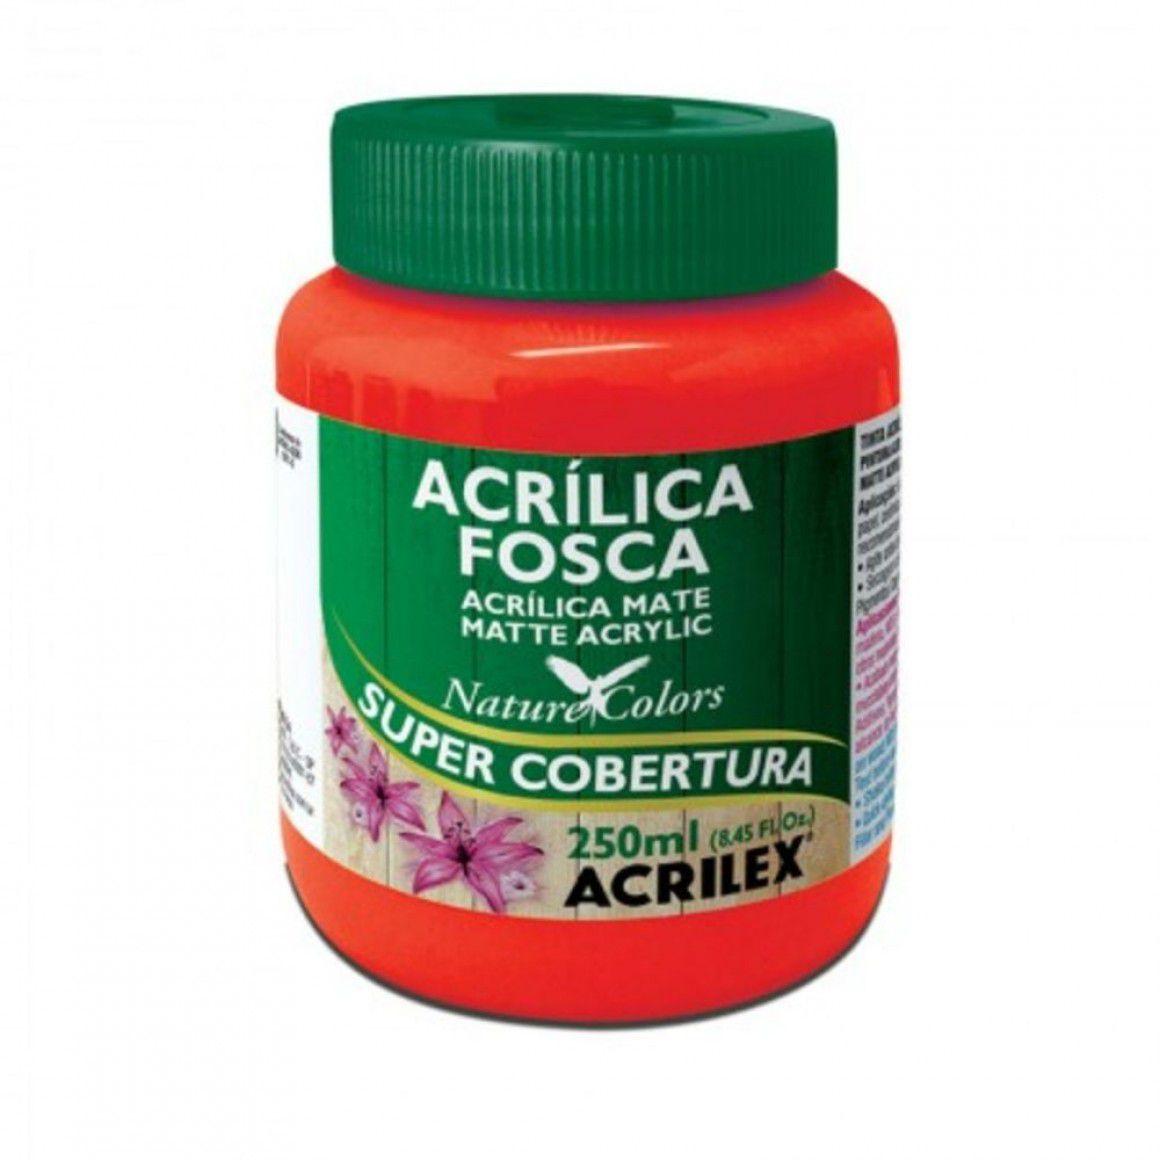 Tinta Acrilica Acrilex Fosca 250ml Vermelho Fogo 507 03525 25280